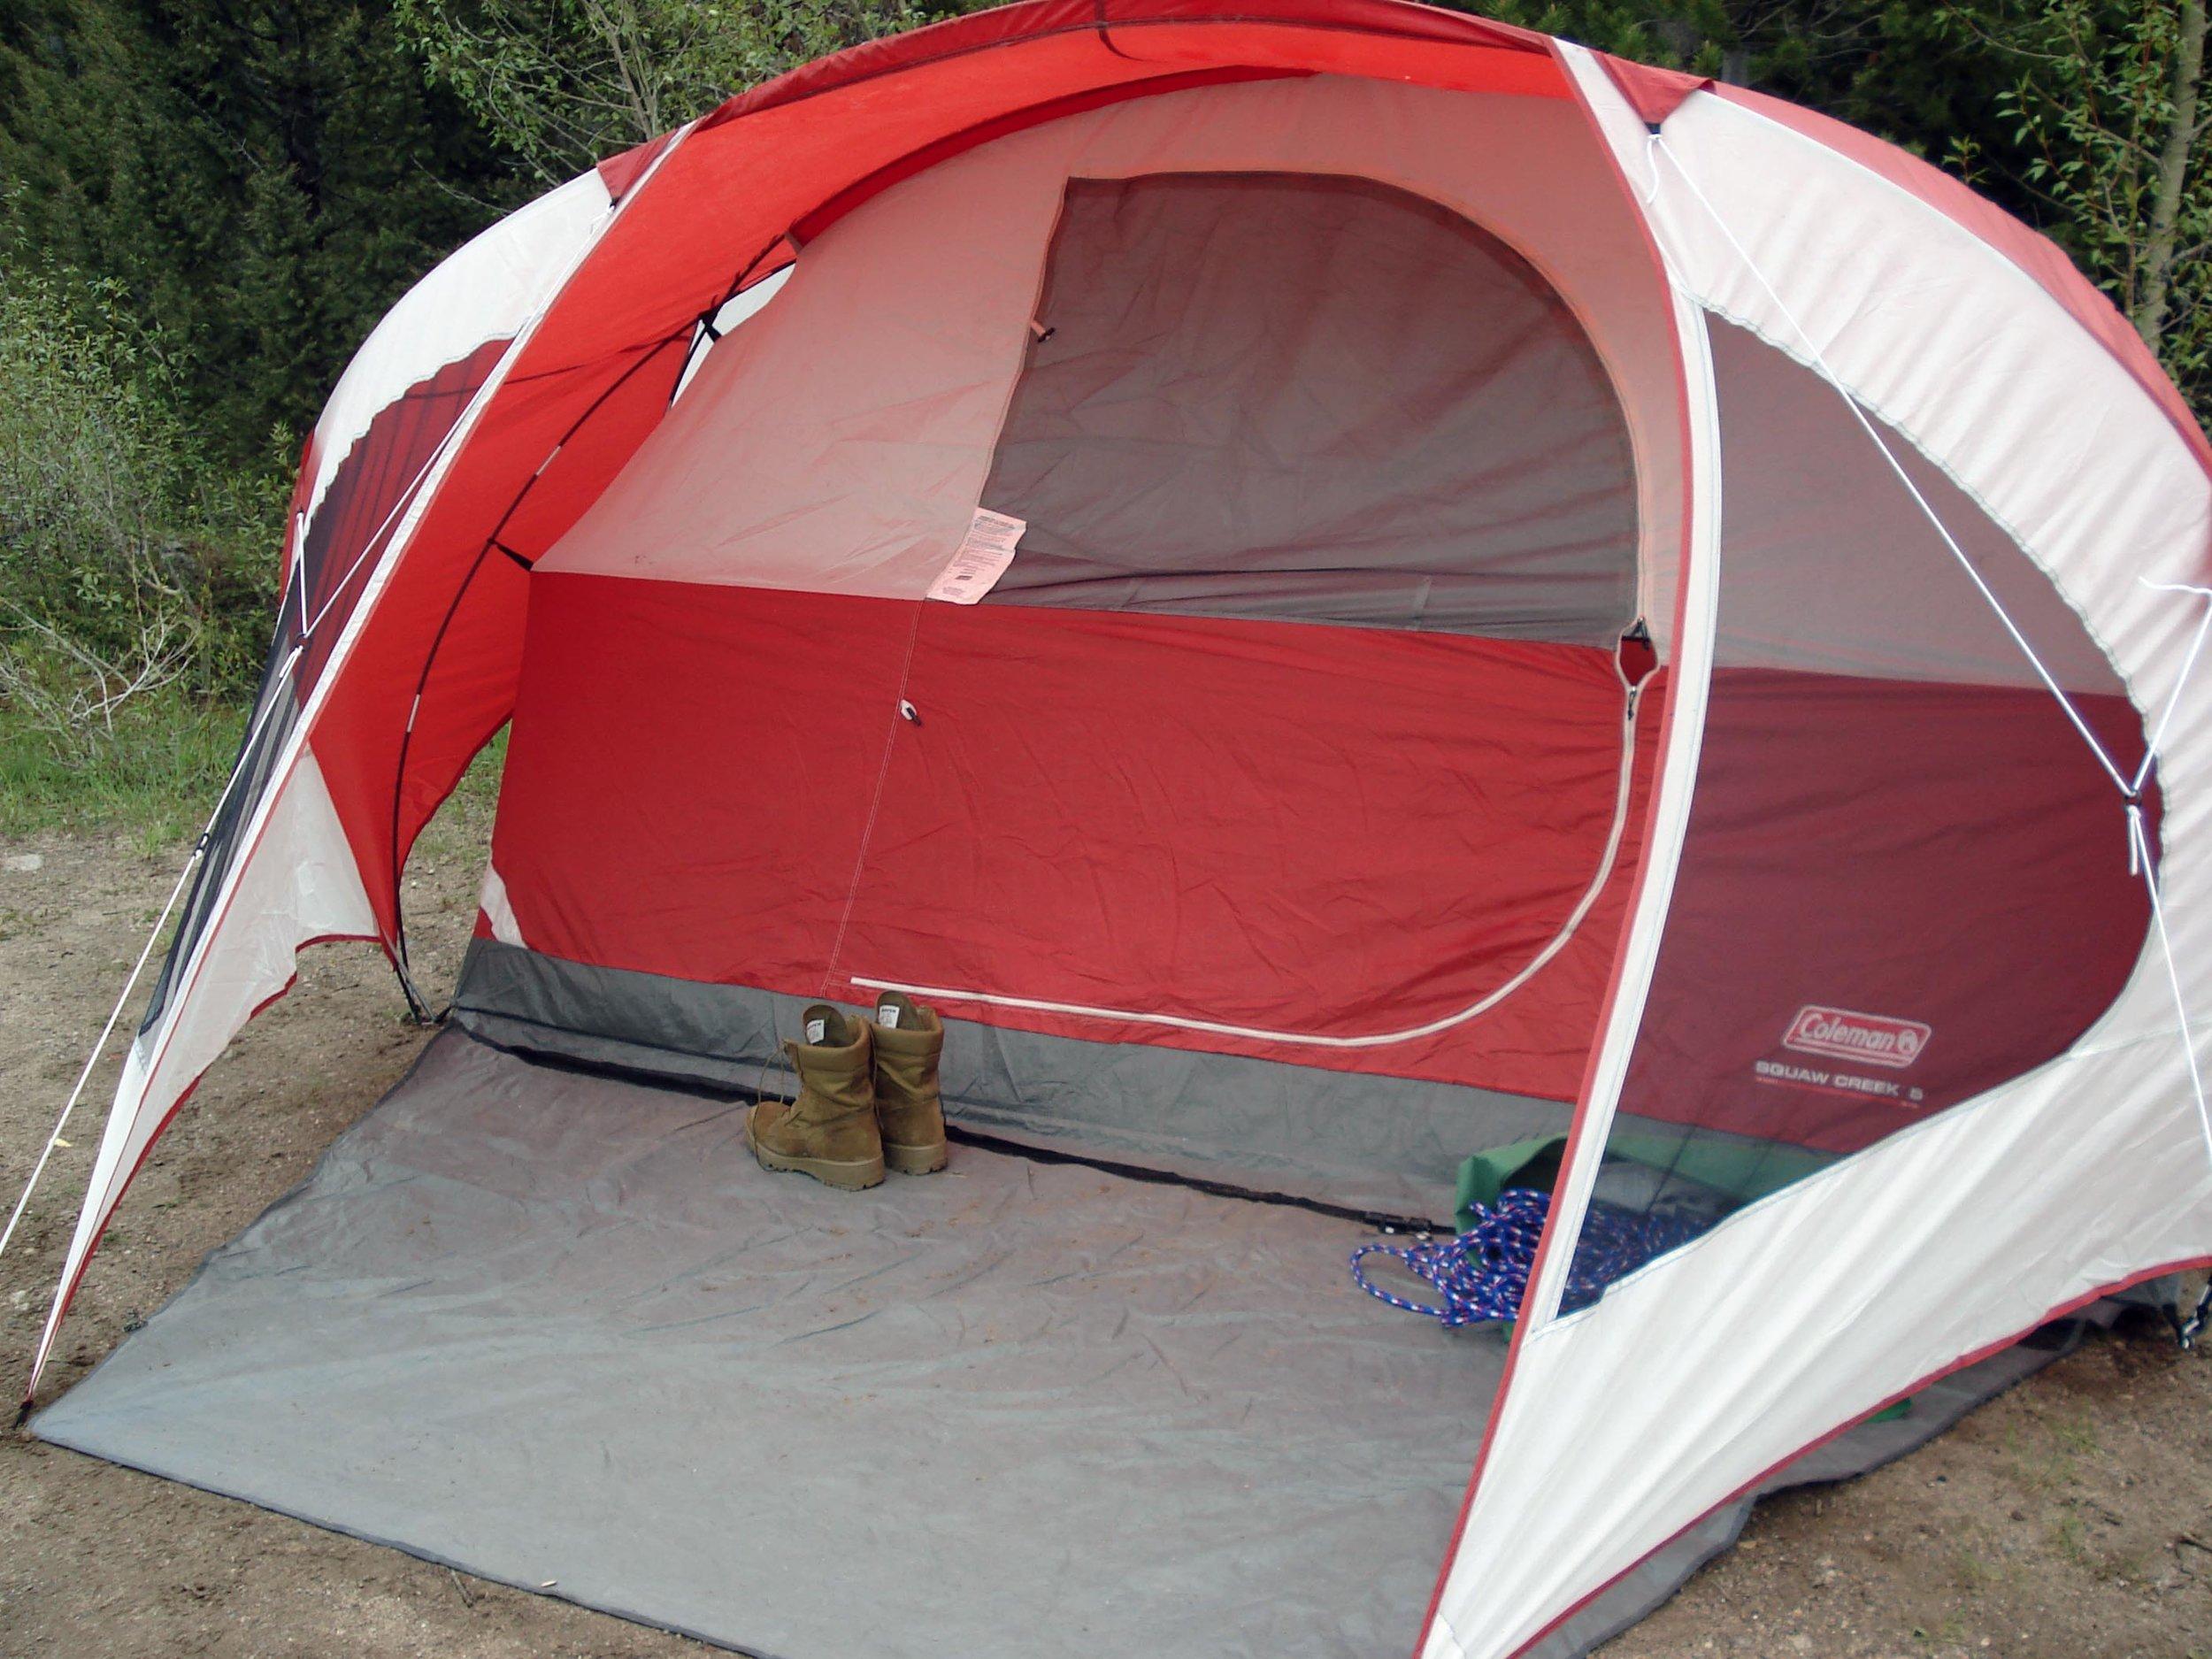 Camping at Hyalite Reservoir near Bozeman, Montana